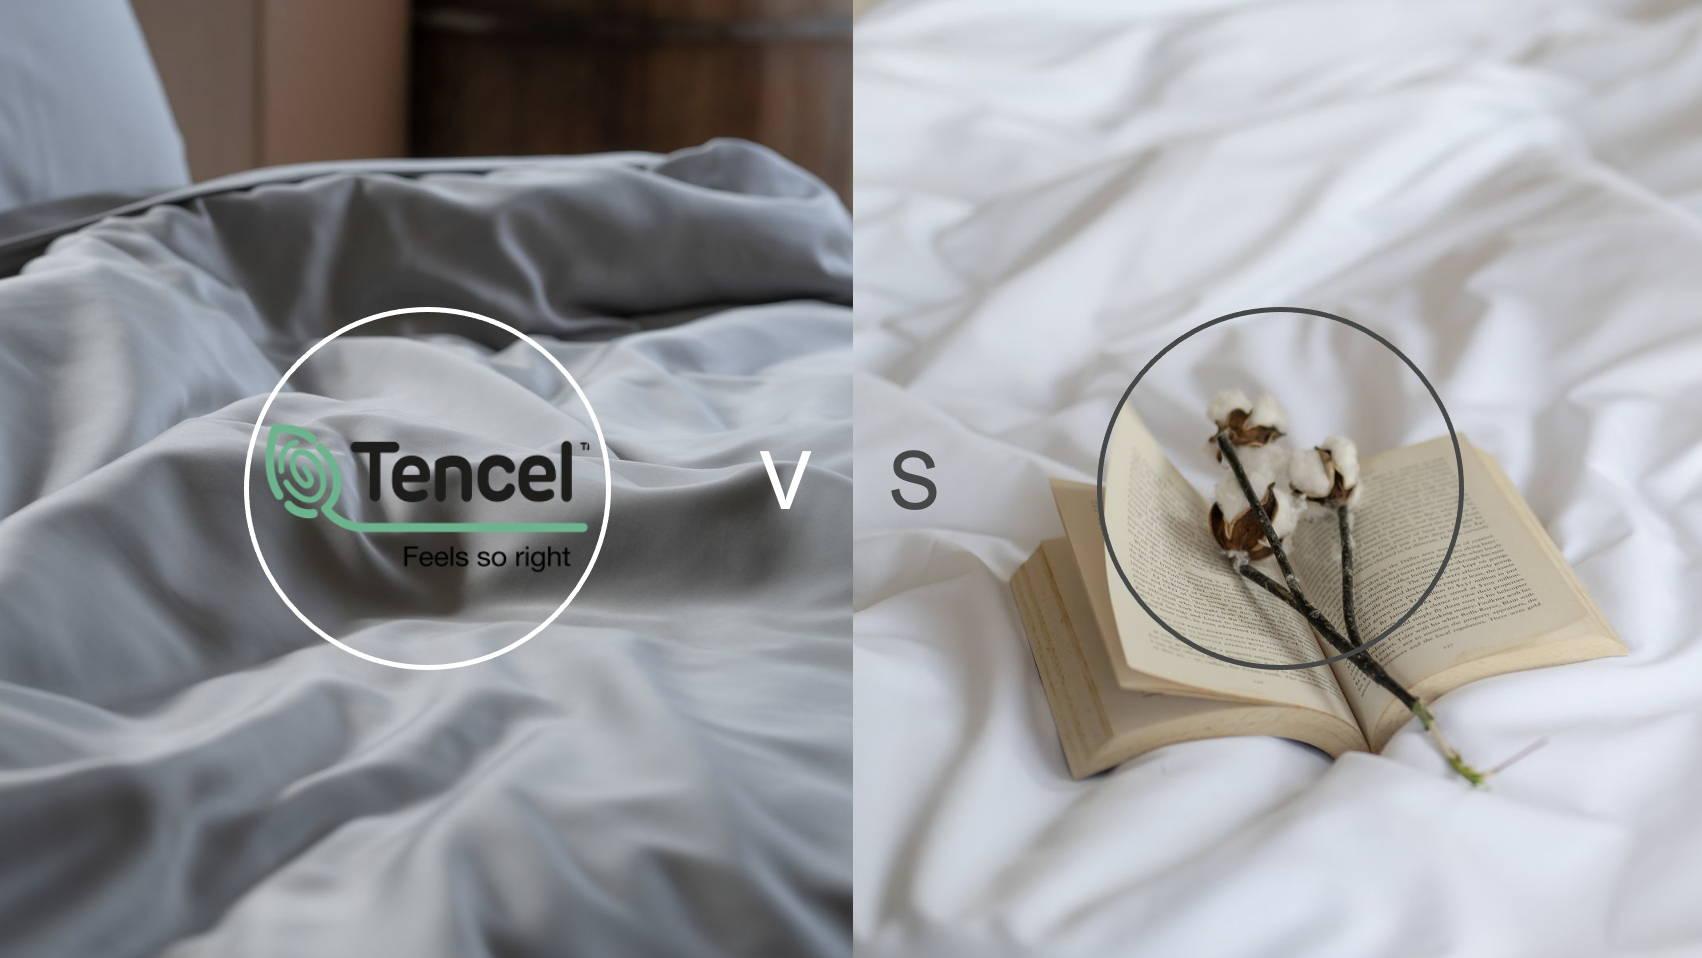 TENCEL vs Cotton sheets